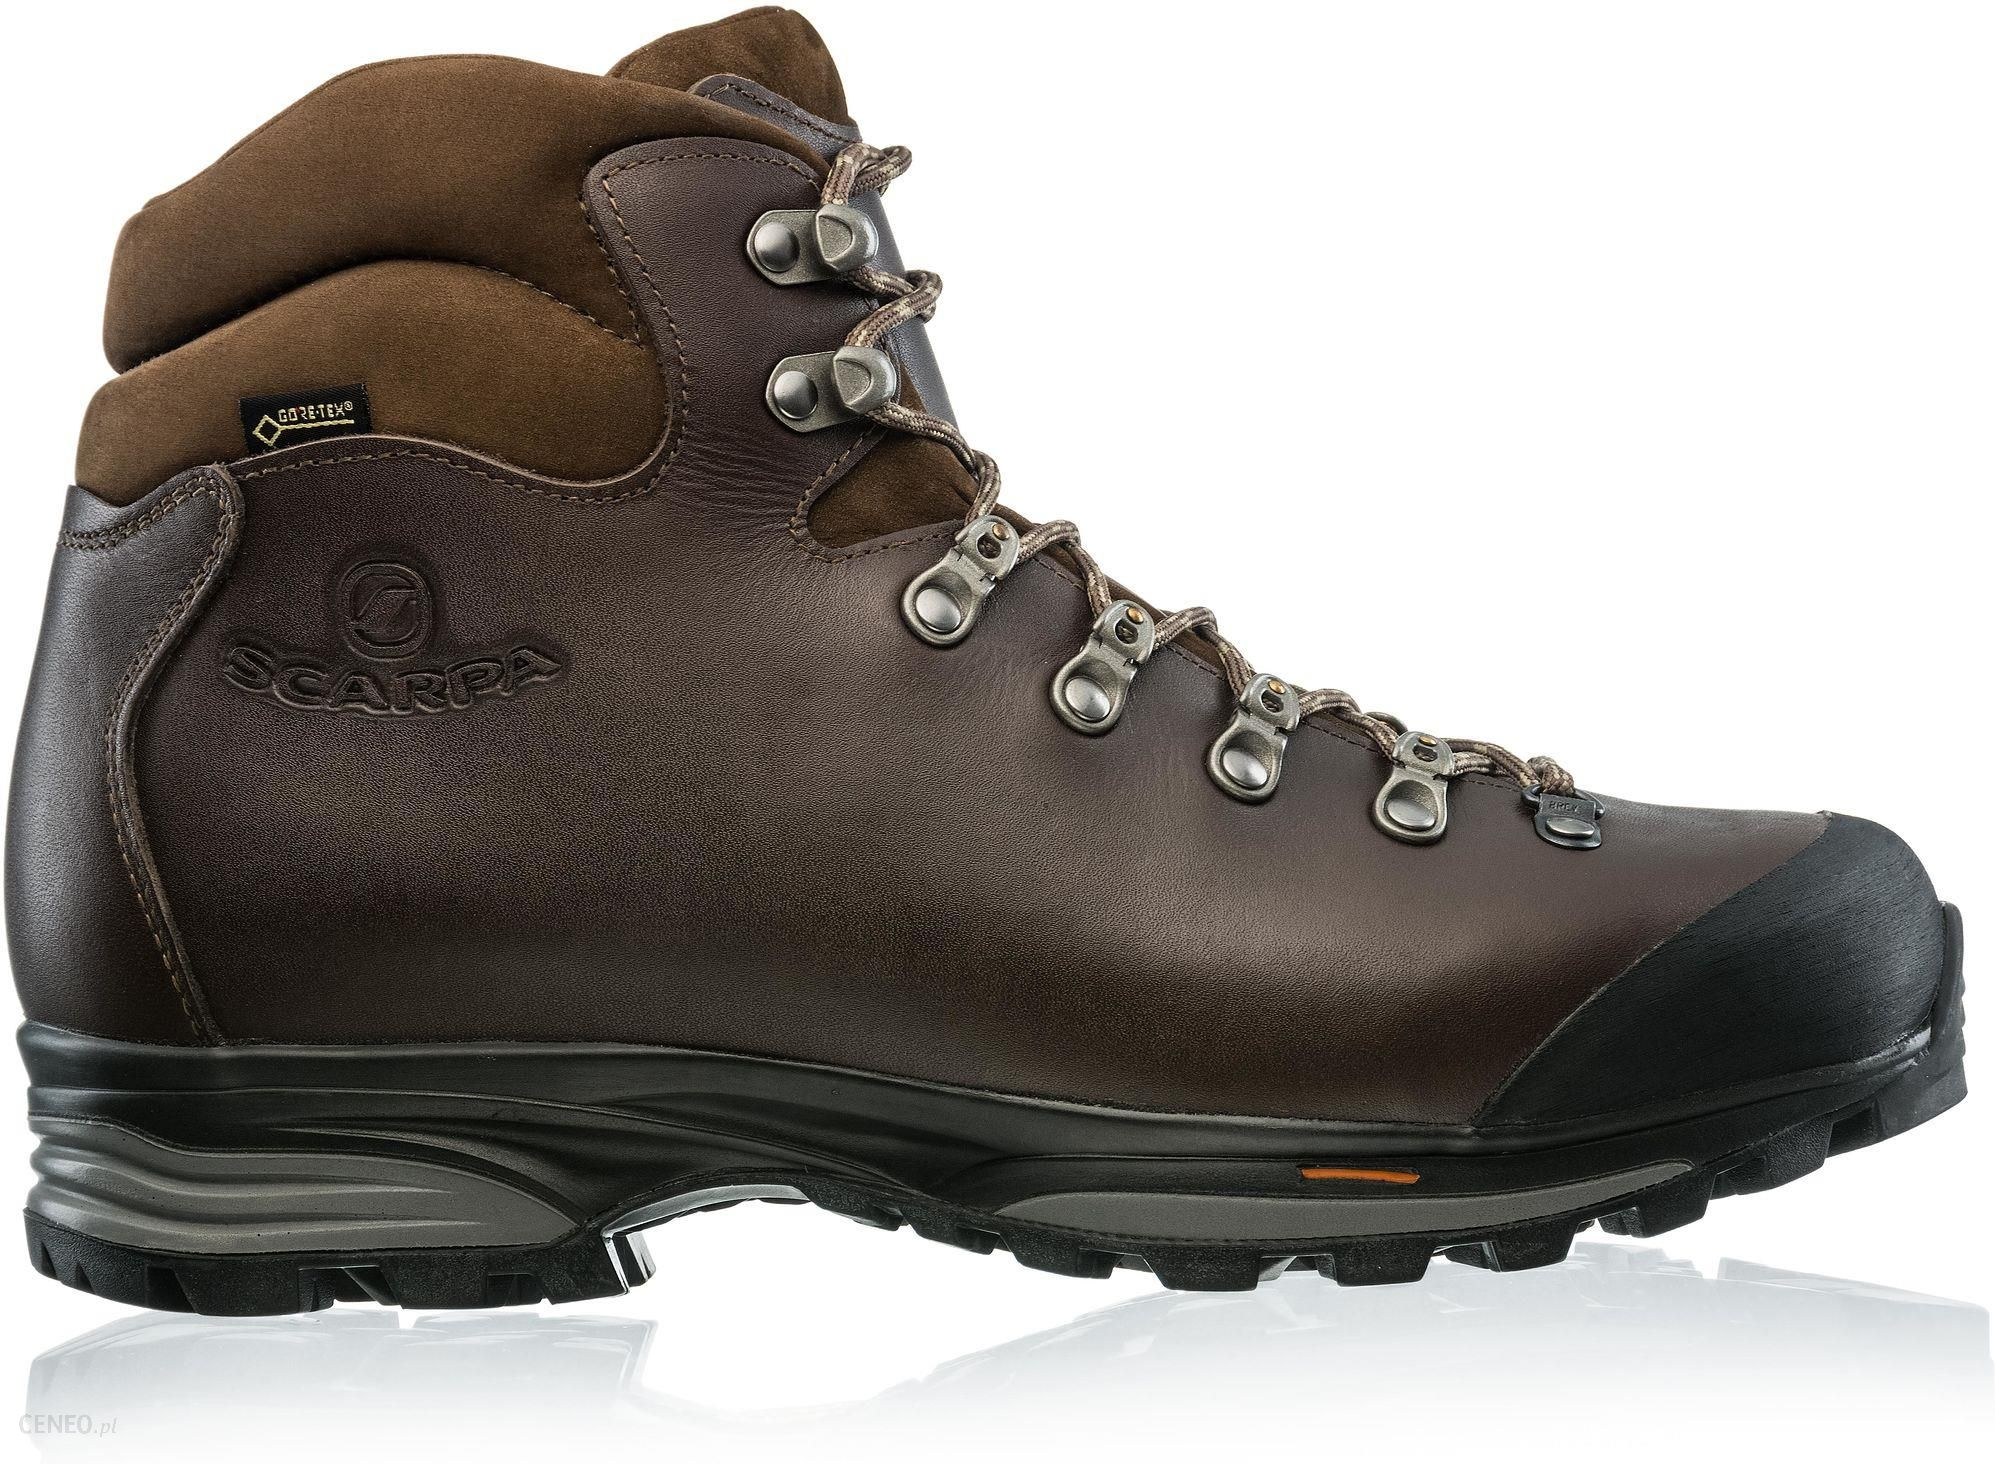 Buty trekkingowe Scarpa Buty Trekkingowe Delta Gtx Test Di Moro 61030T Ceny i opinie Ceneo.pl